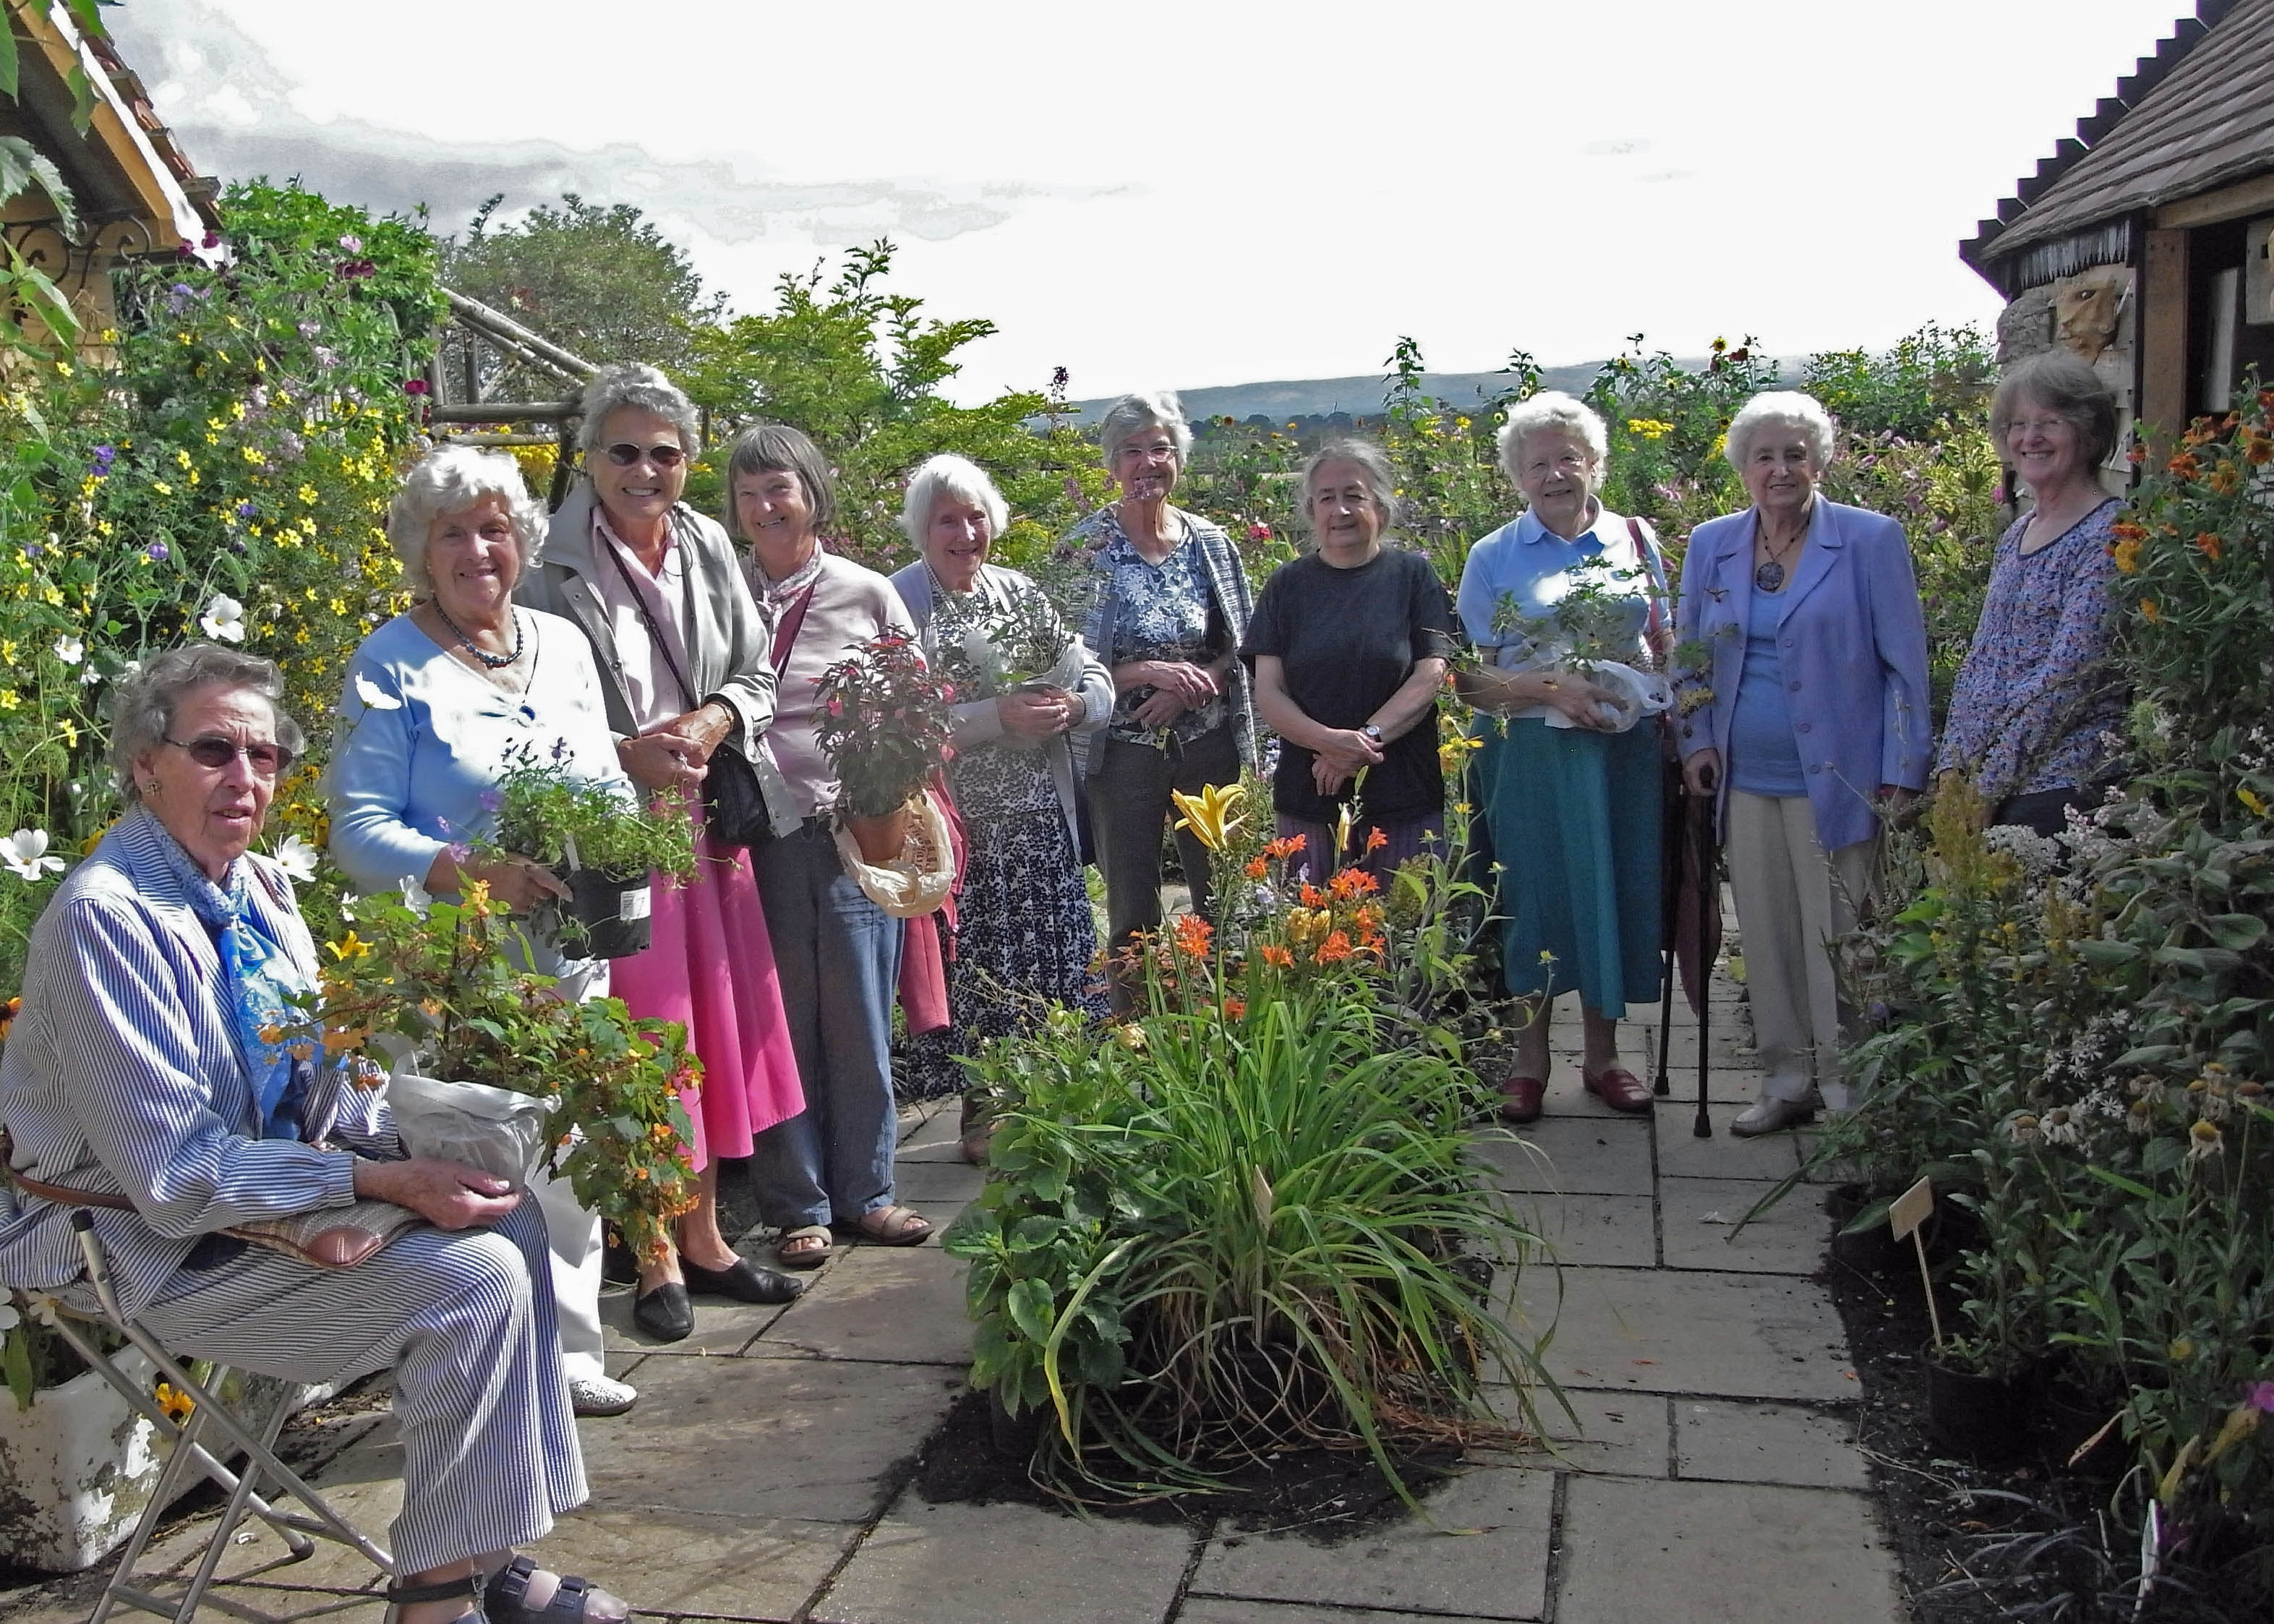 Visit to Hilltop Gardens, Dorset.